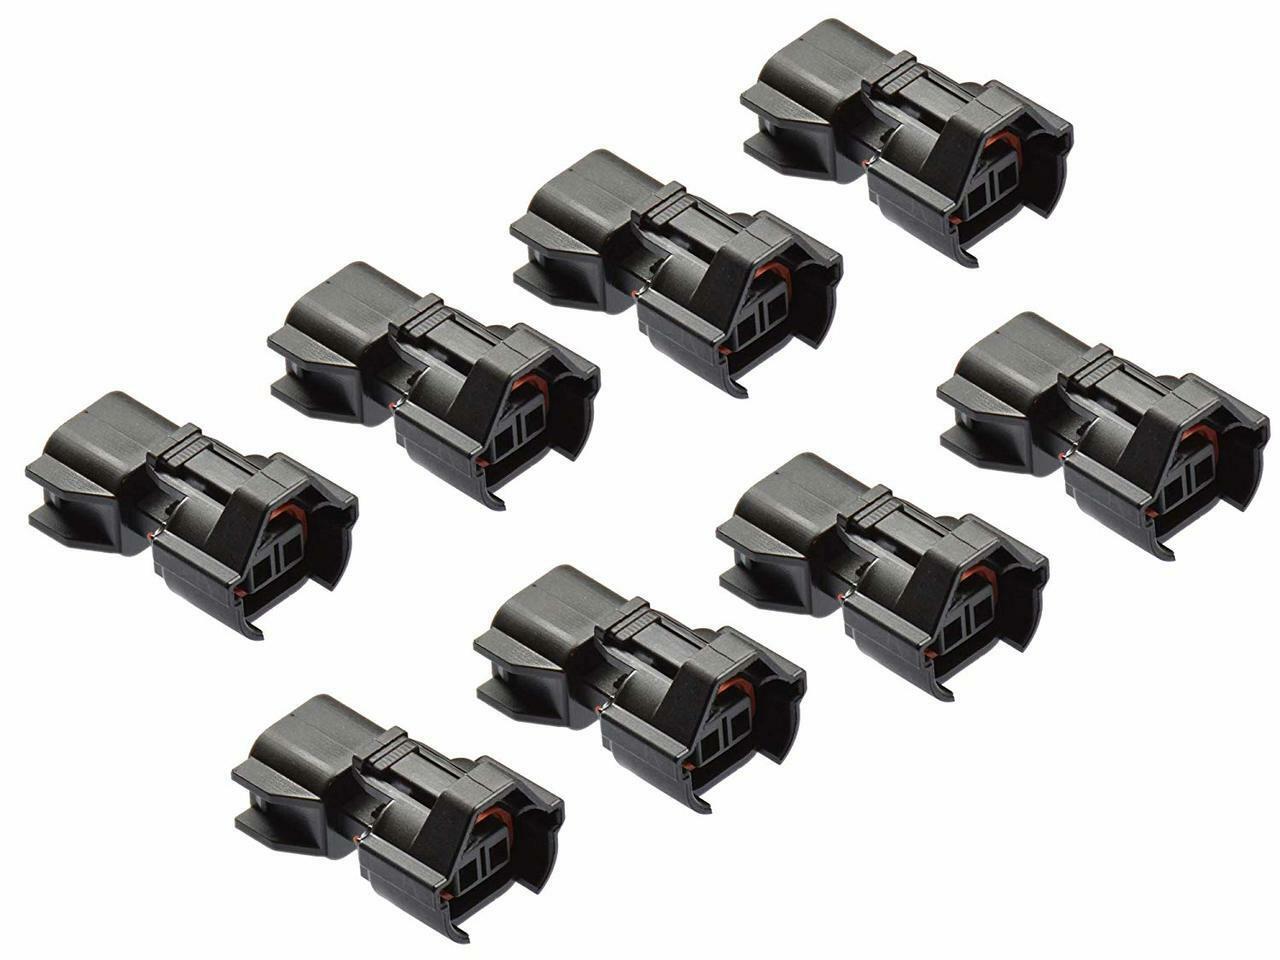 Qty 8 EV1 Jetronic Minitimer Female to EV6 USCAR Male Fuel Injector Adapter